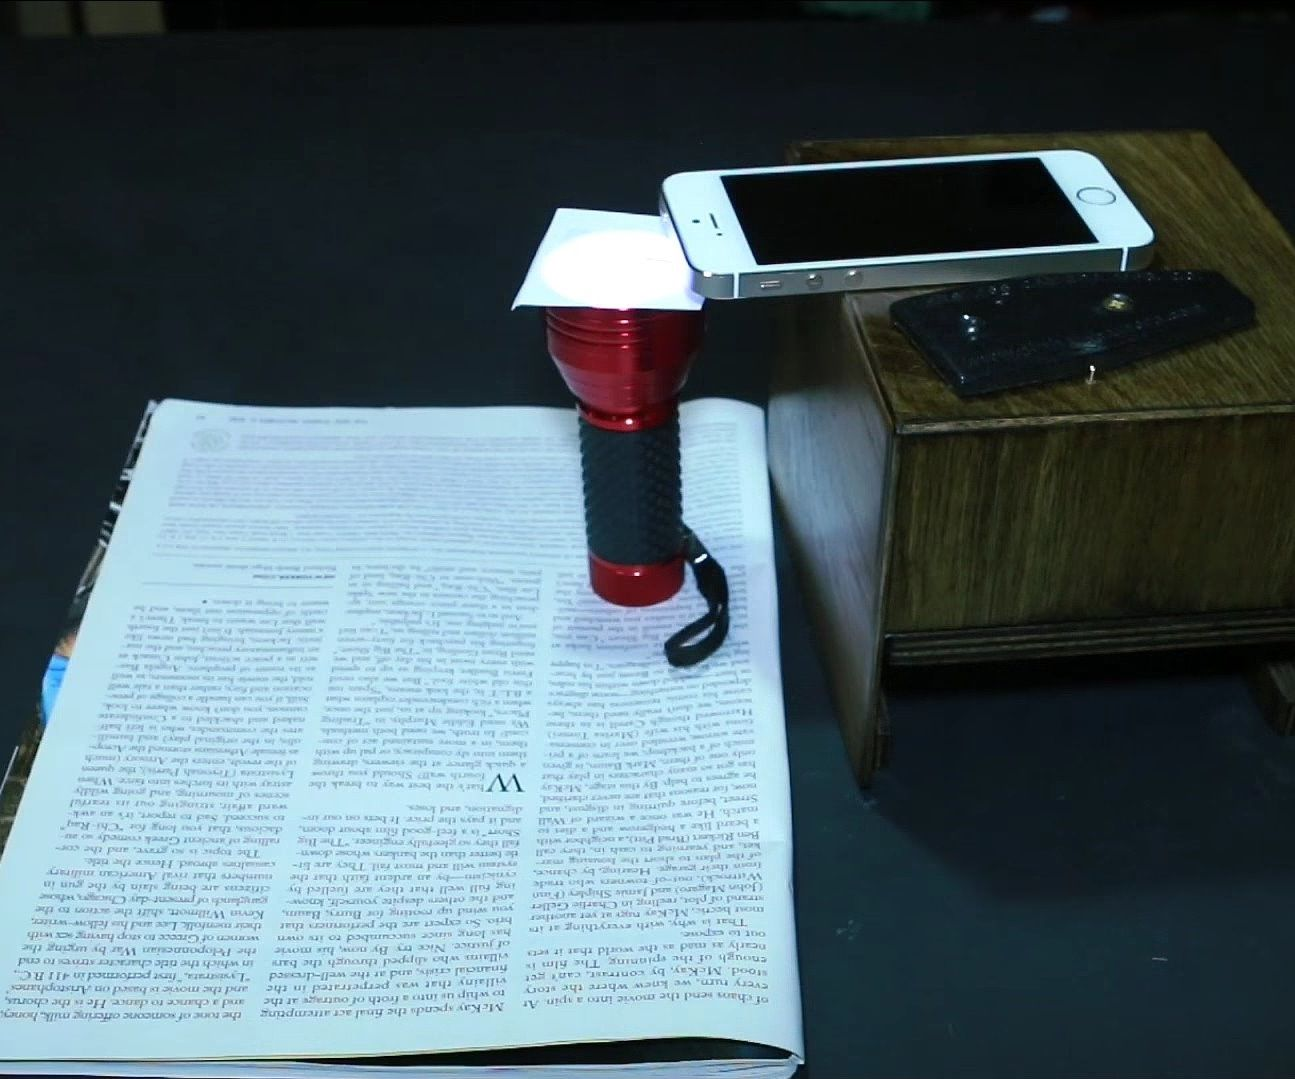 DIY Microscope Using Smartphone